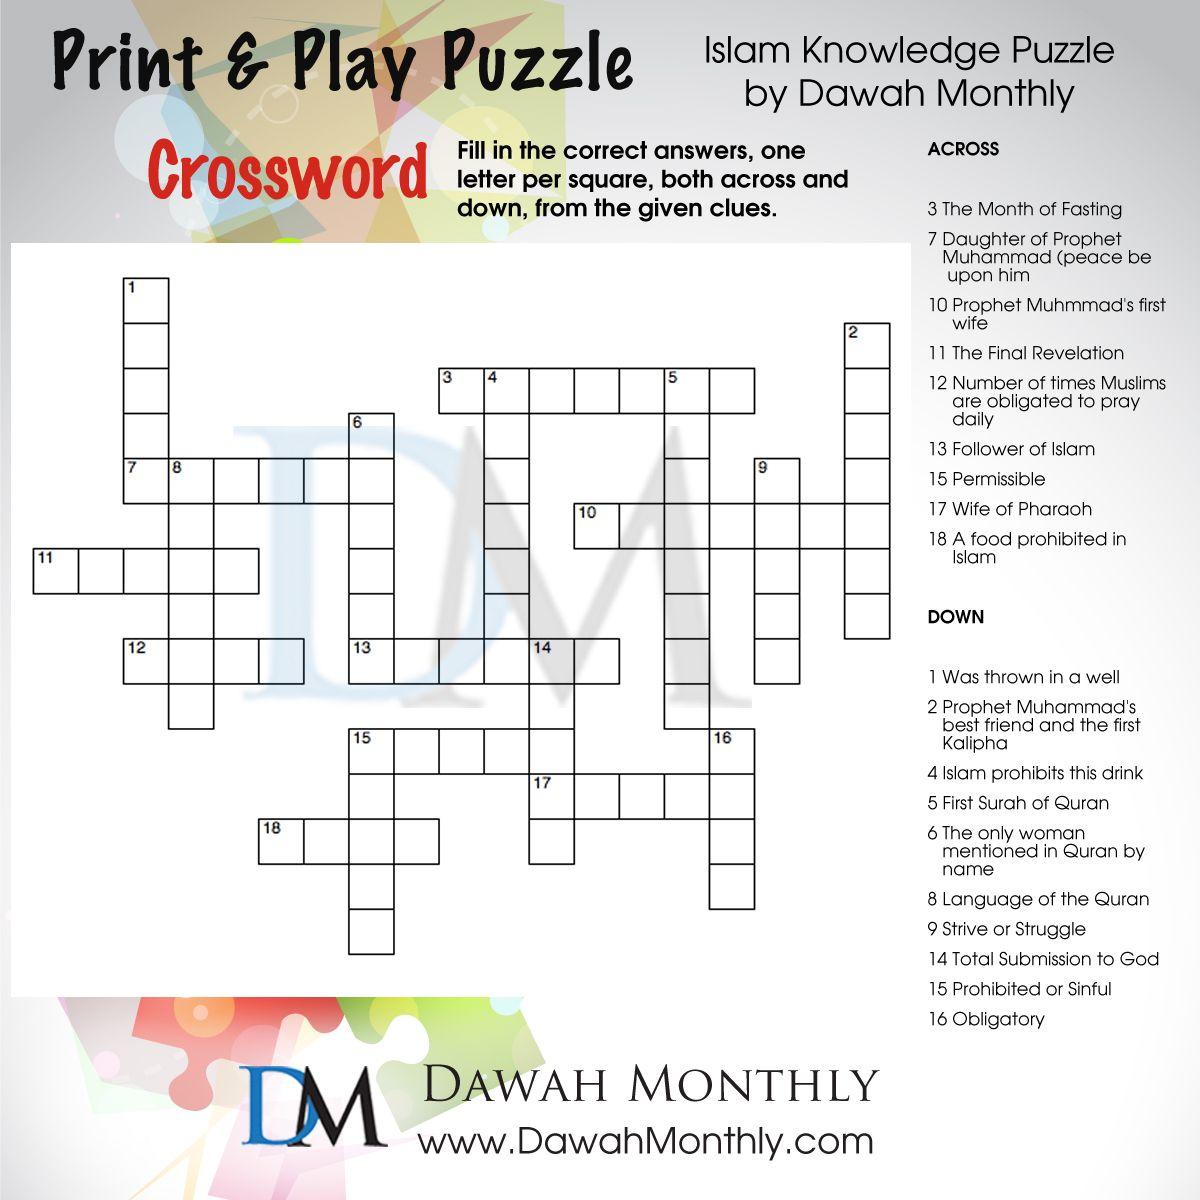 islam crossword puzzle puzzles islamic posters ramadan crafts diy eid cards. Black Bedroom Furniture Sets. Home Design Ideas